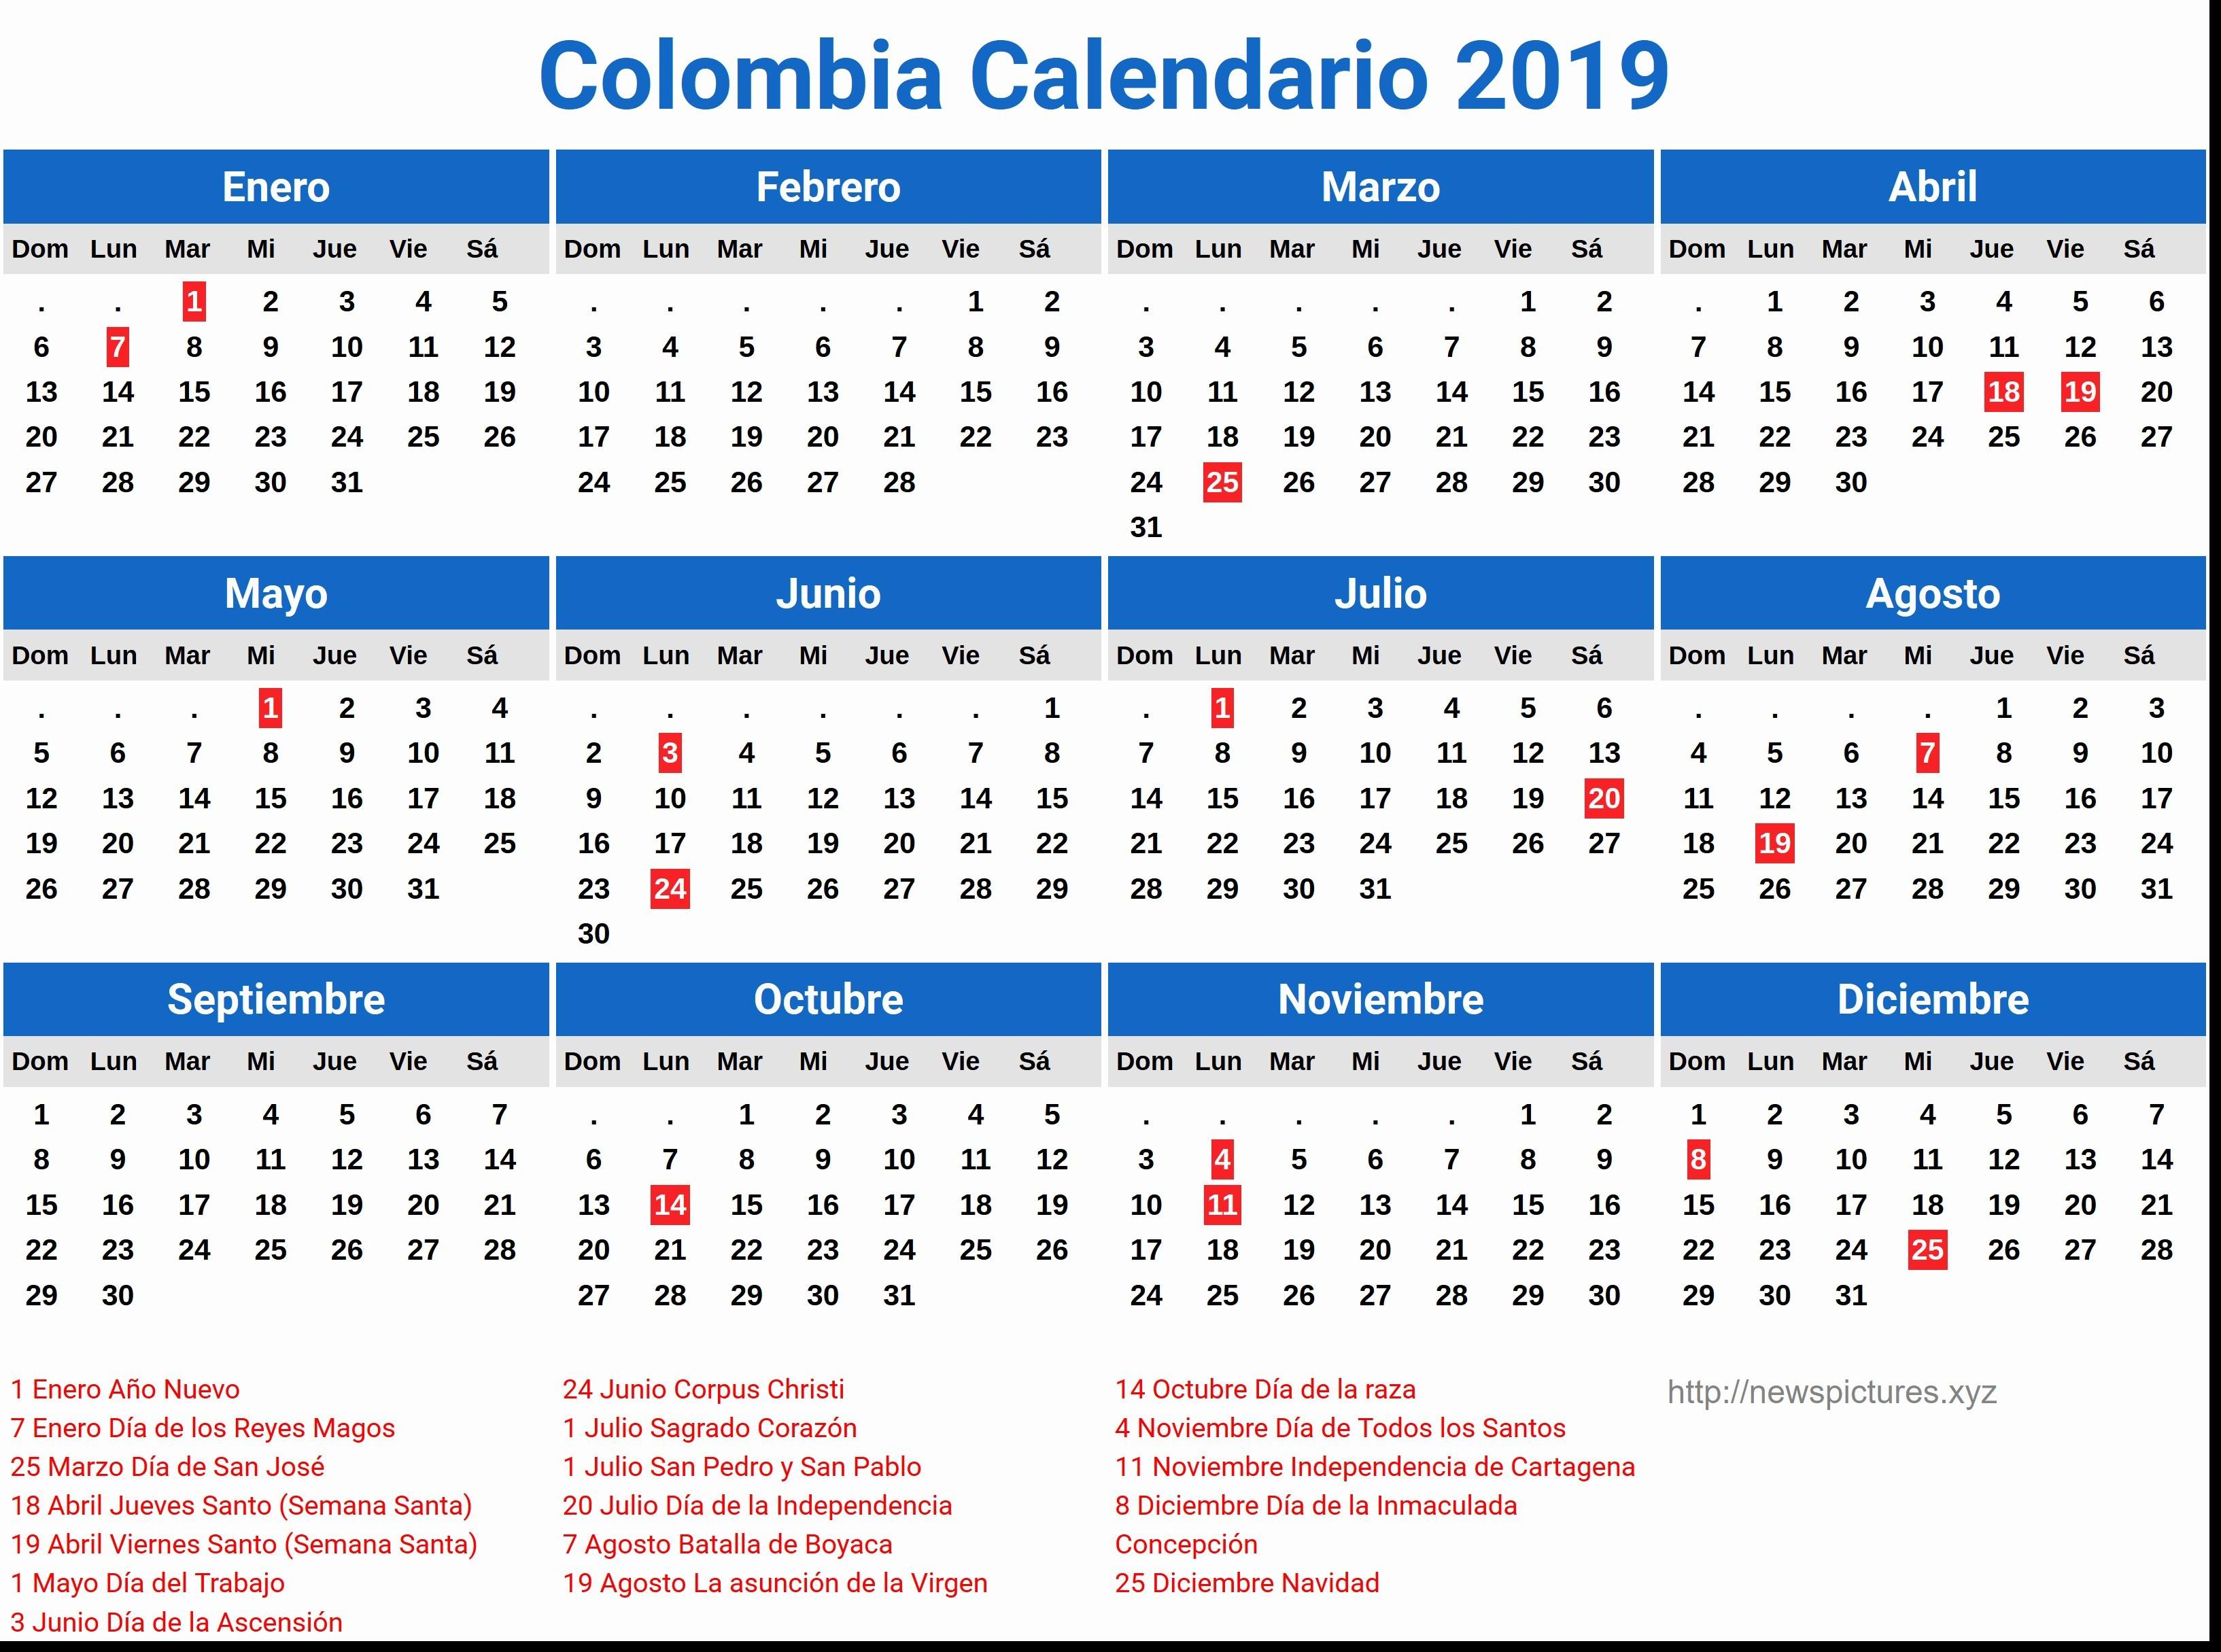 calendario 2019 mexico con dias festivos para imprimir mas recientes calendario meccanocar 2019 calendario marzo 2019 of calendario 2019 mexico con dias festivos para imprimir